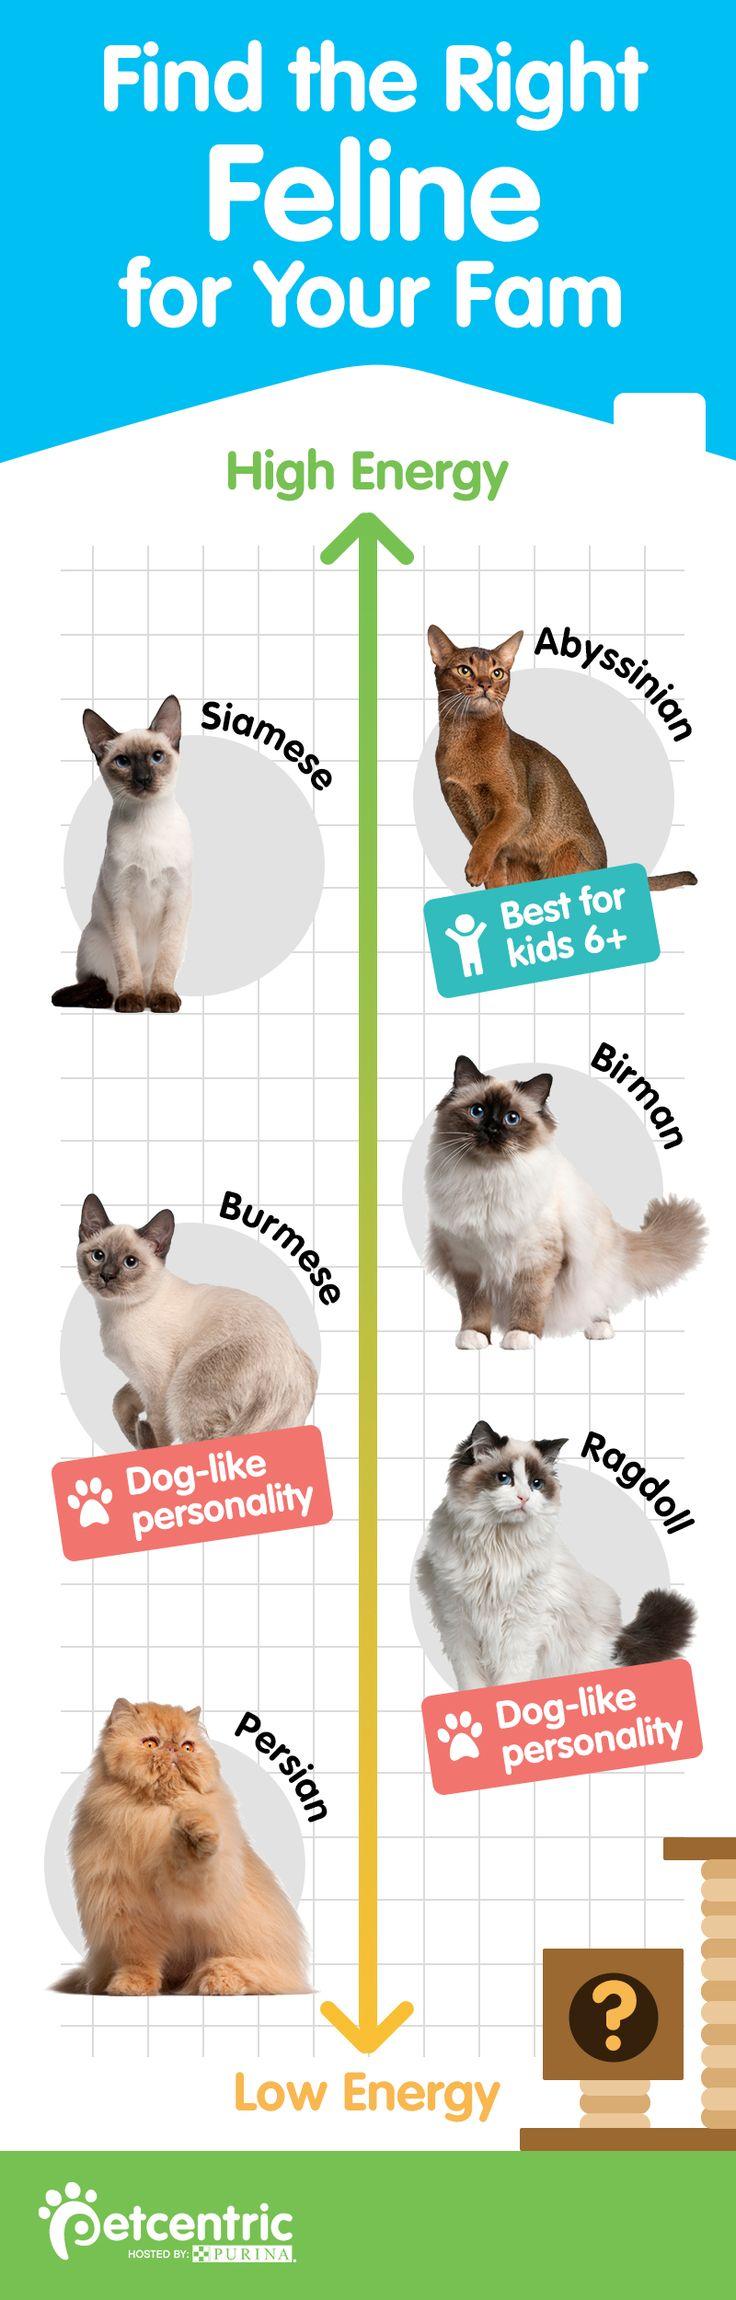 Best 25 Cat breeds ideas on Pinterest